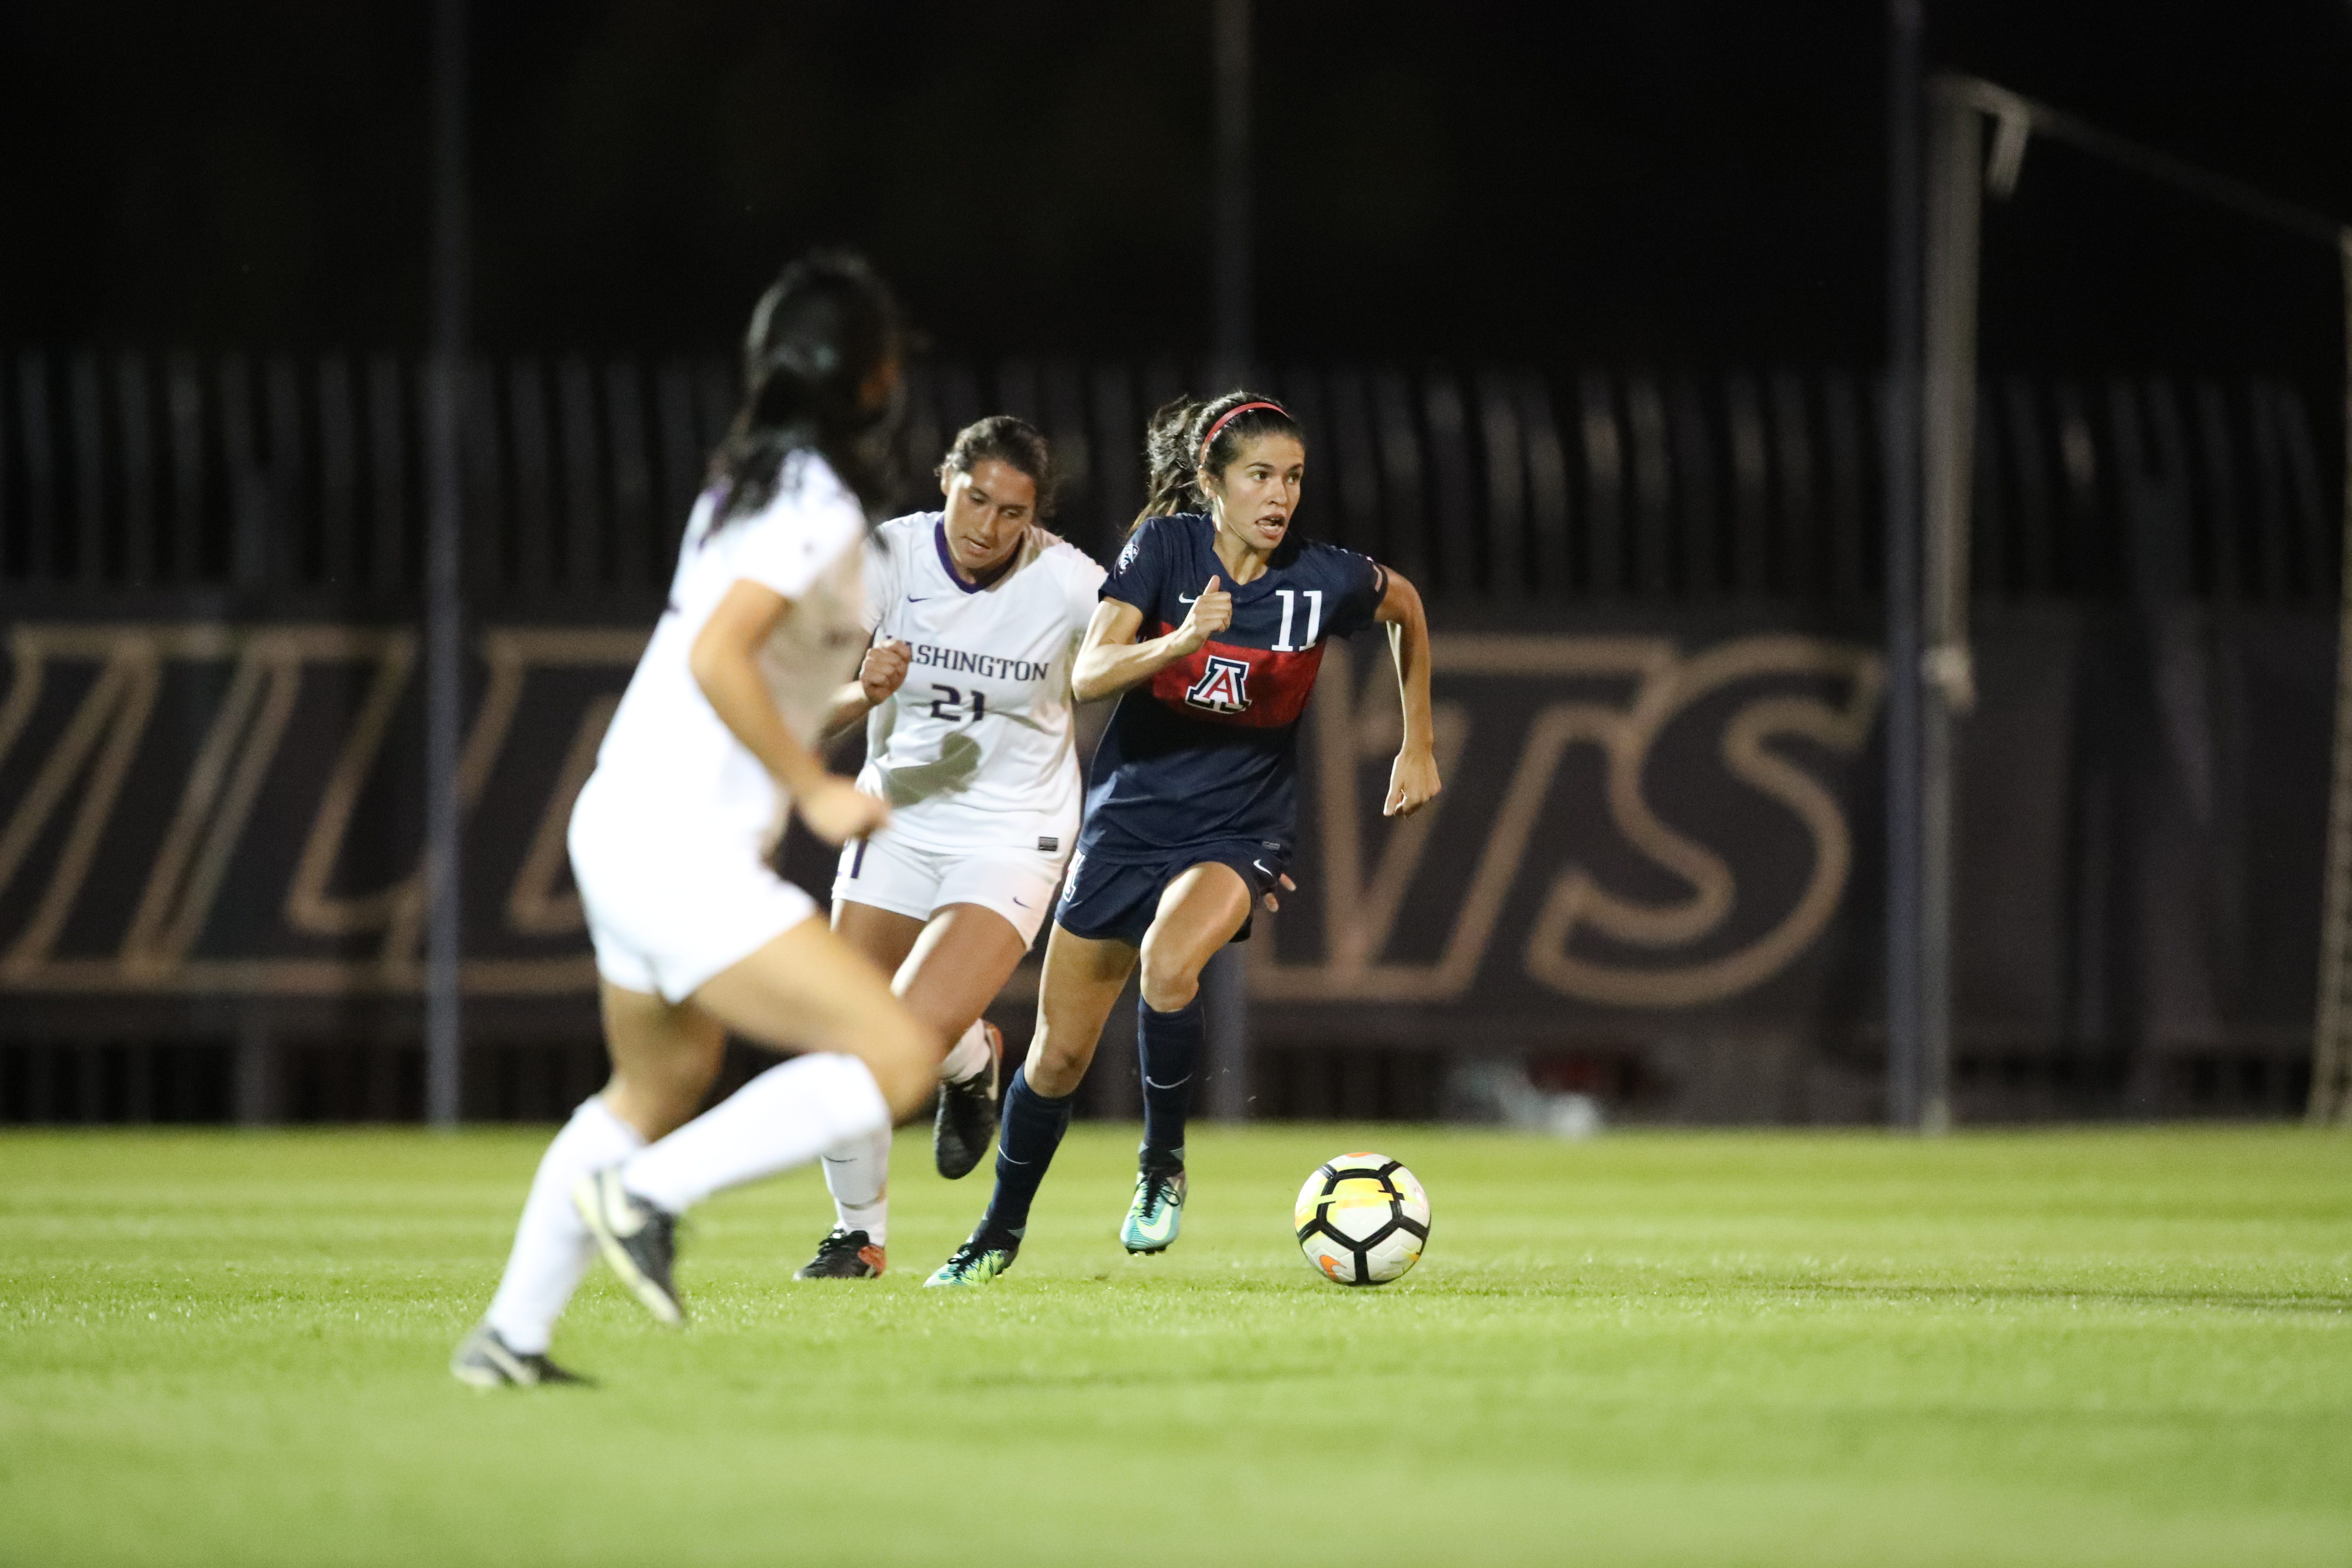 morgan-mcgarry-arizona-wildcats-soccer-womens-2019-redshirt-senior-season-end-high-note